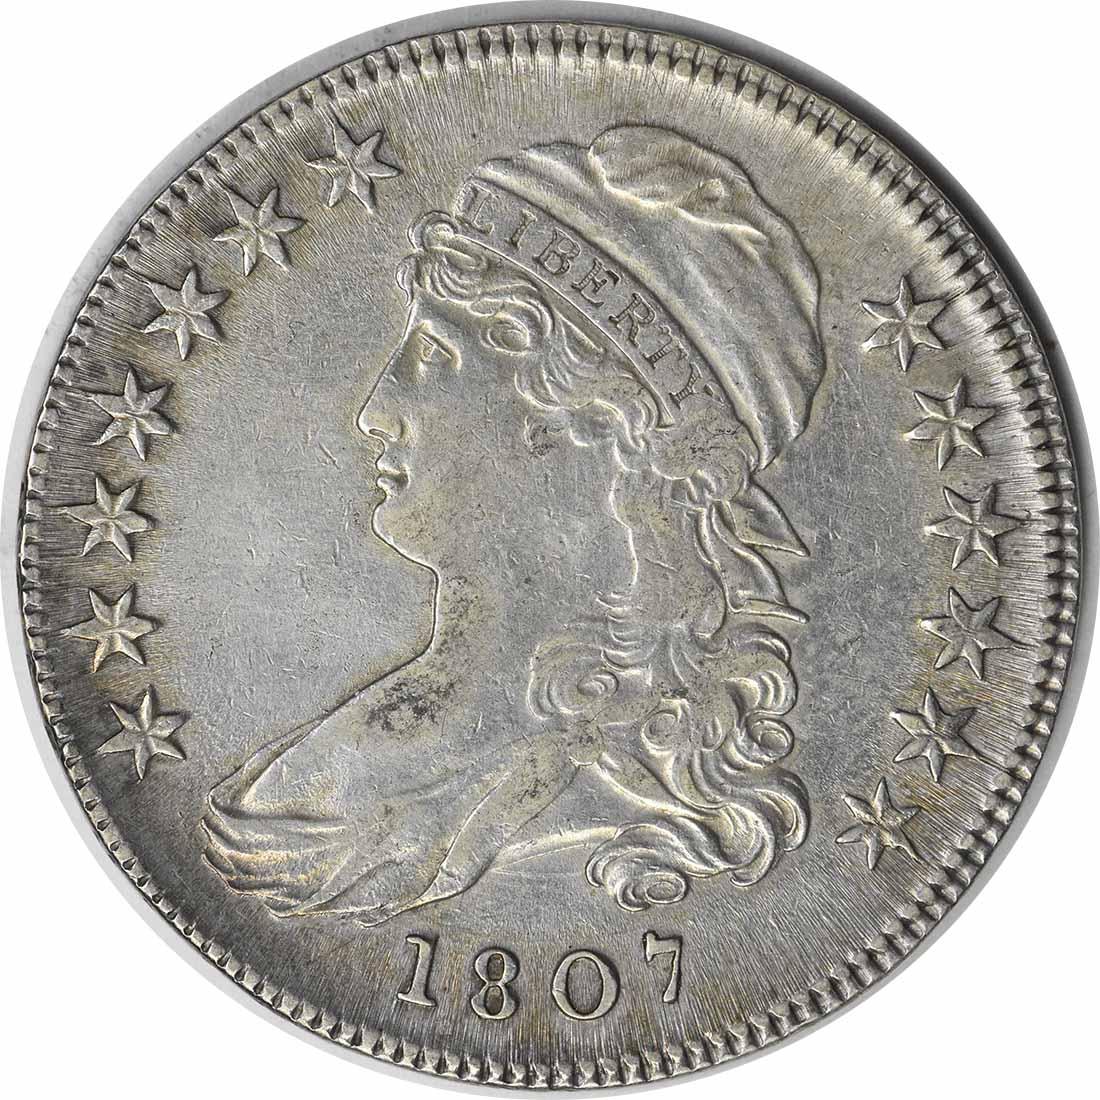 1807 50/20 Bust Half Dollar EF Uncertified